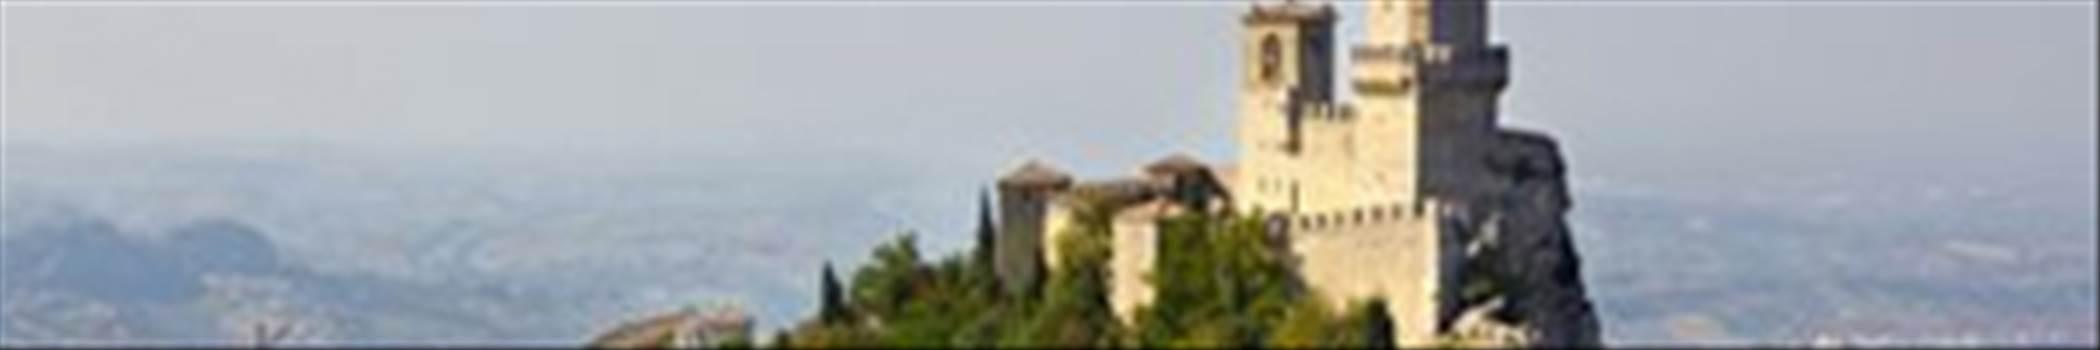 castle.jpg by shoresofelysium